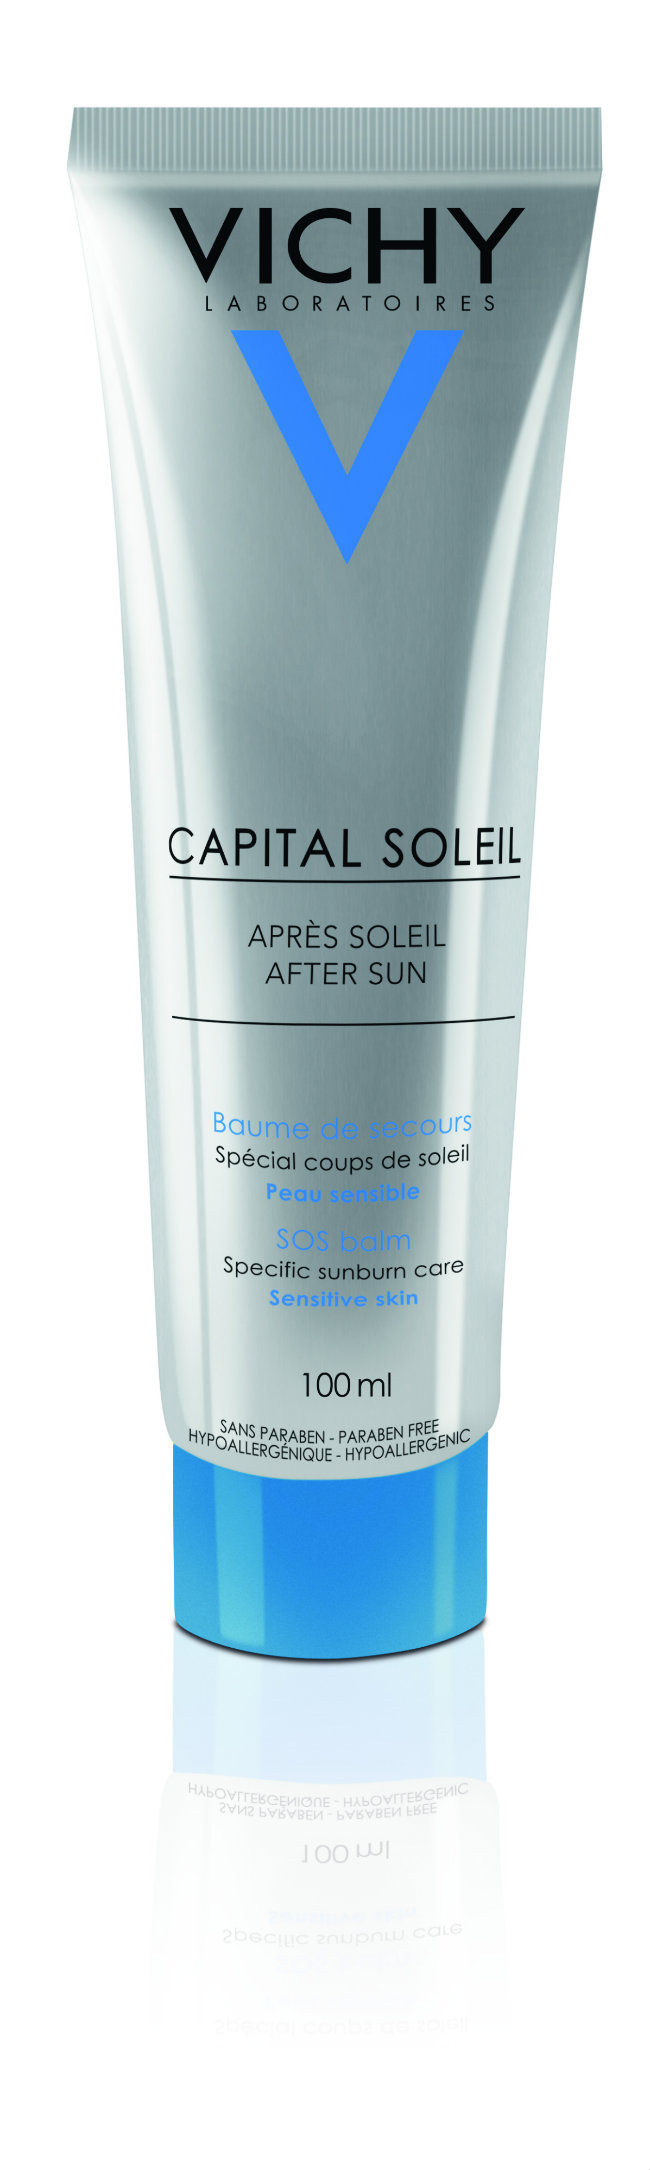 Vichy S O S balzam1 Capital Soleil: Umirite kožu posle sunčanja